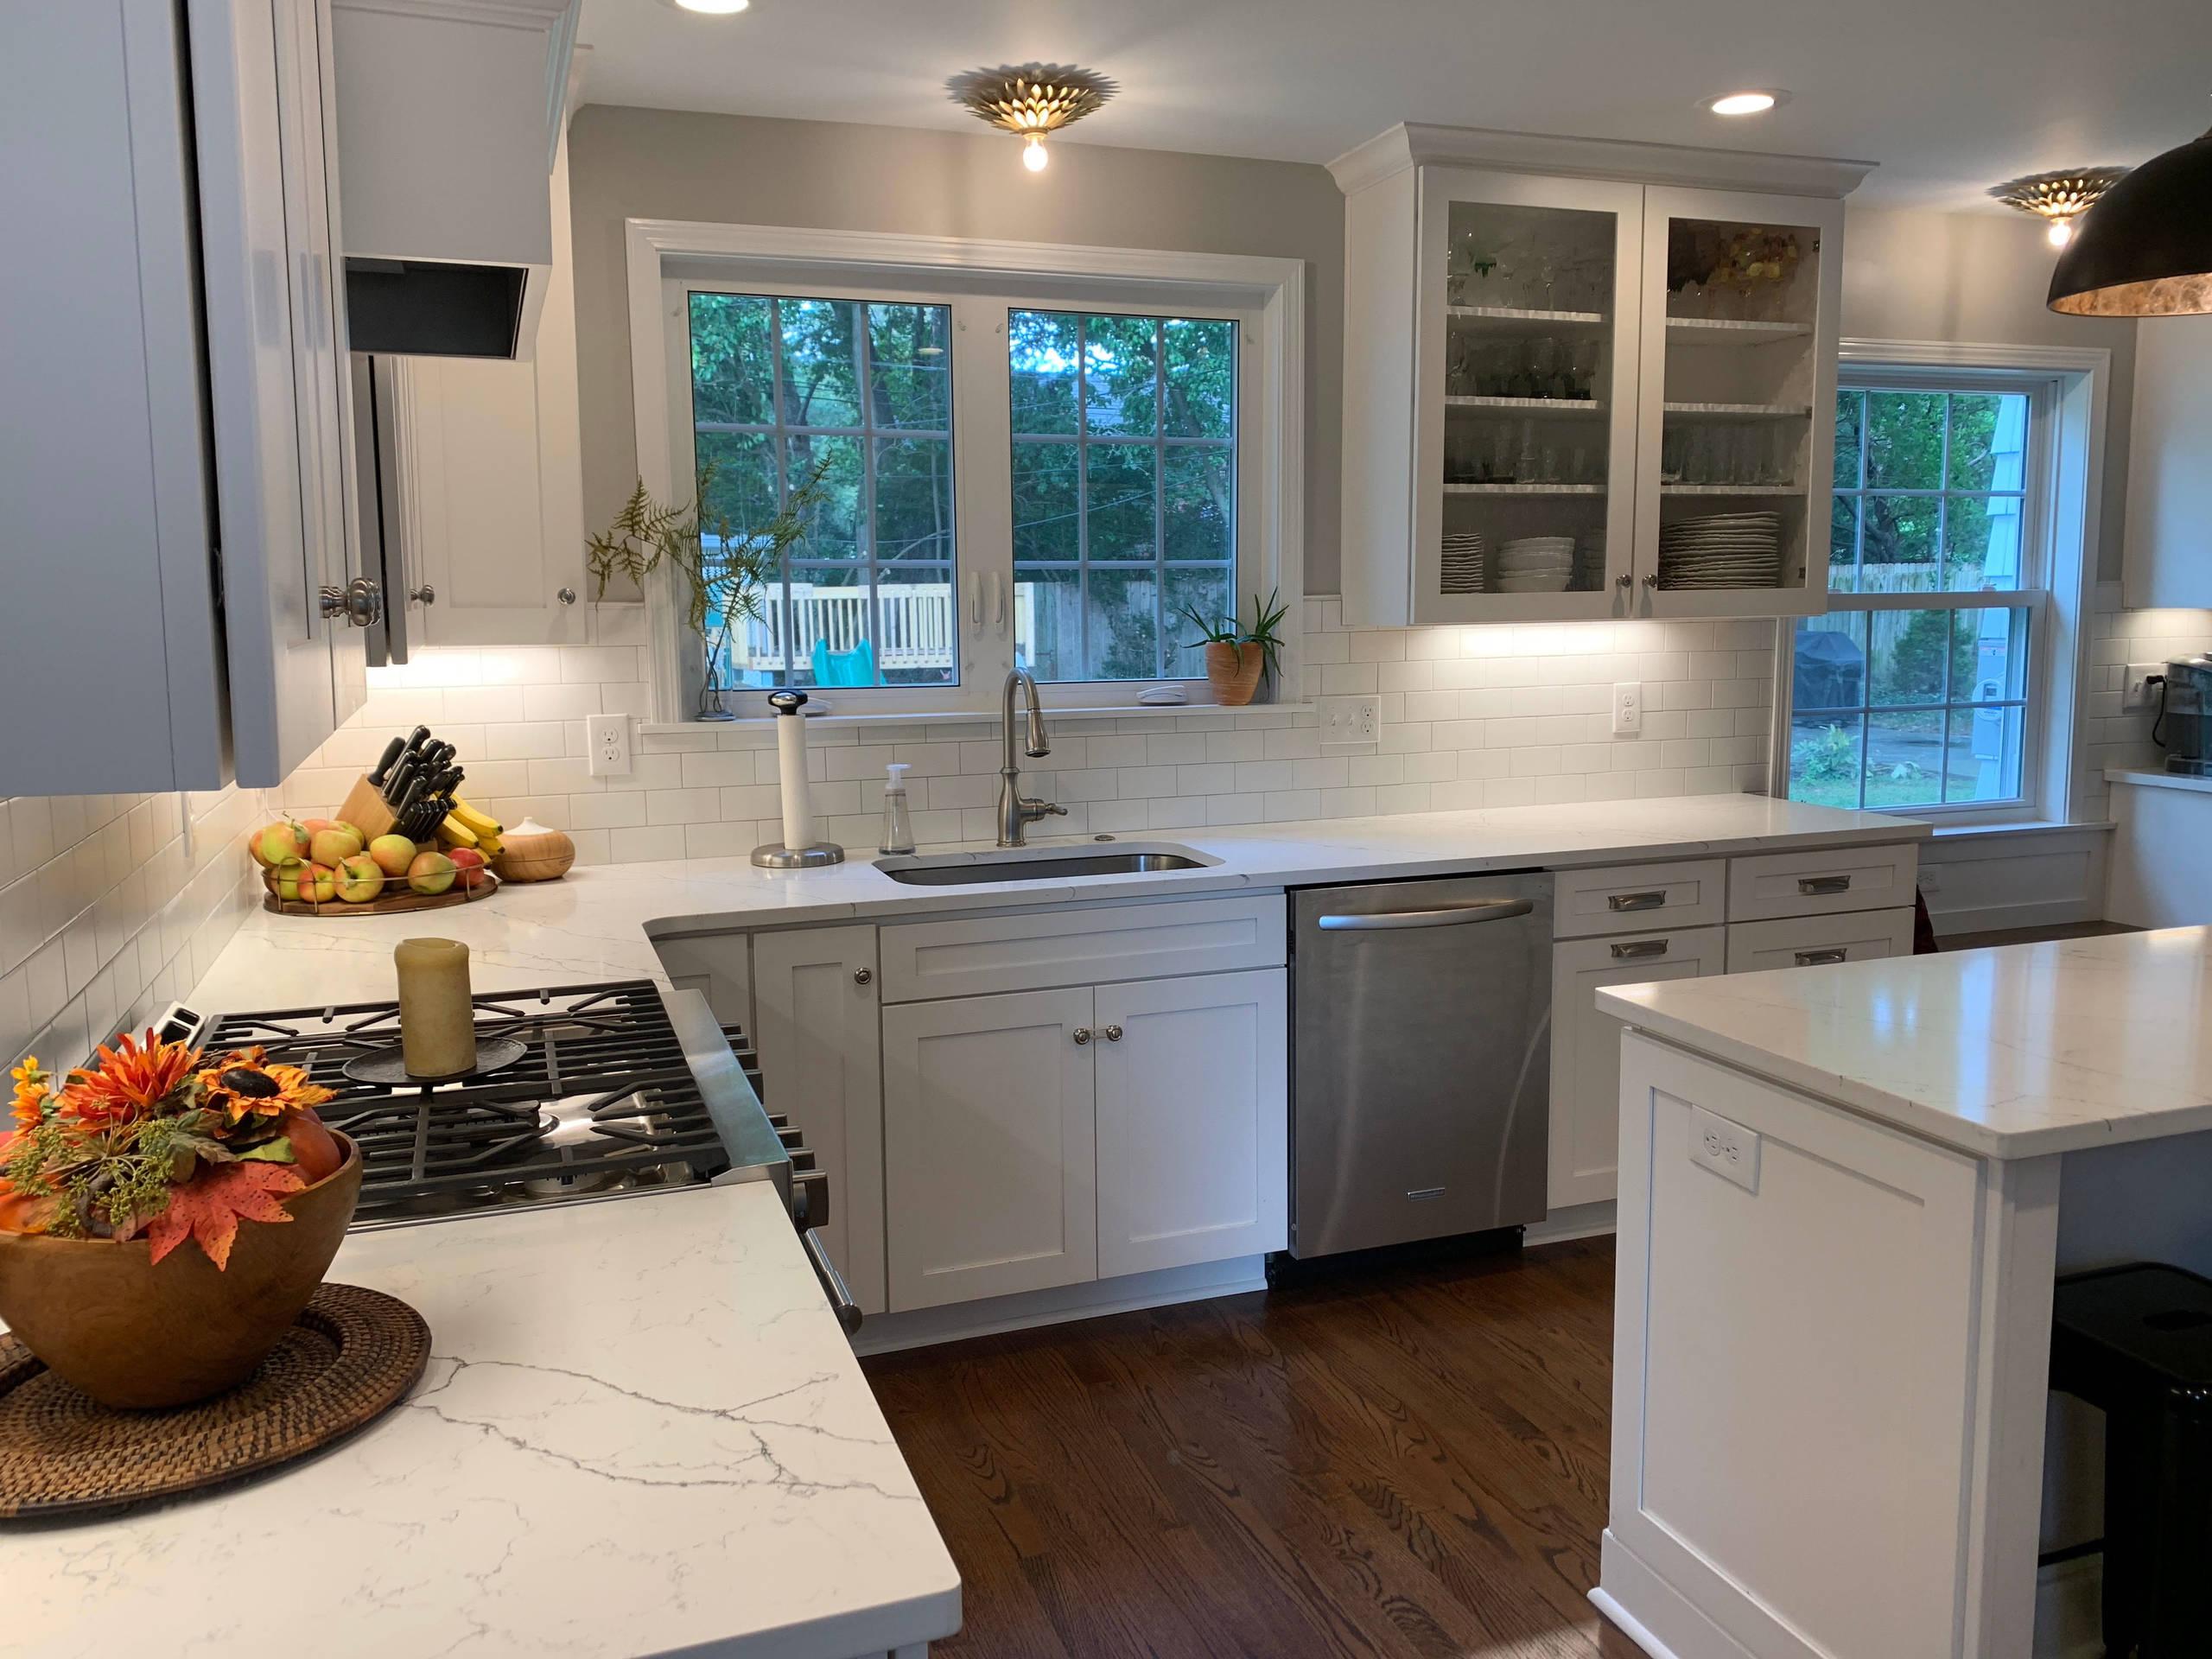 Grandview Transitional Kitchen Renovation